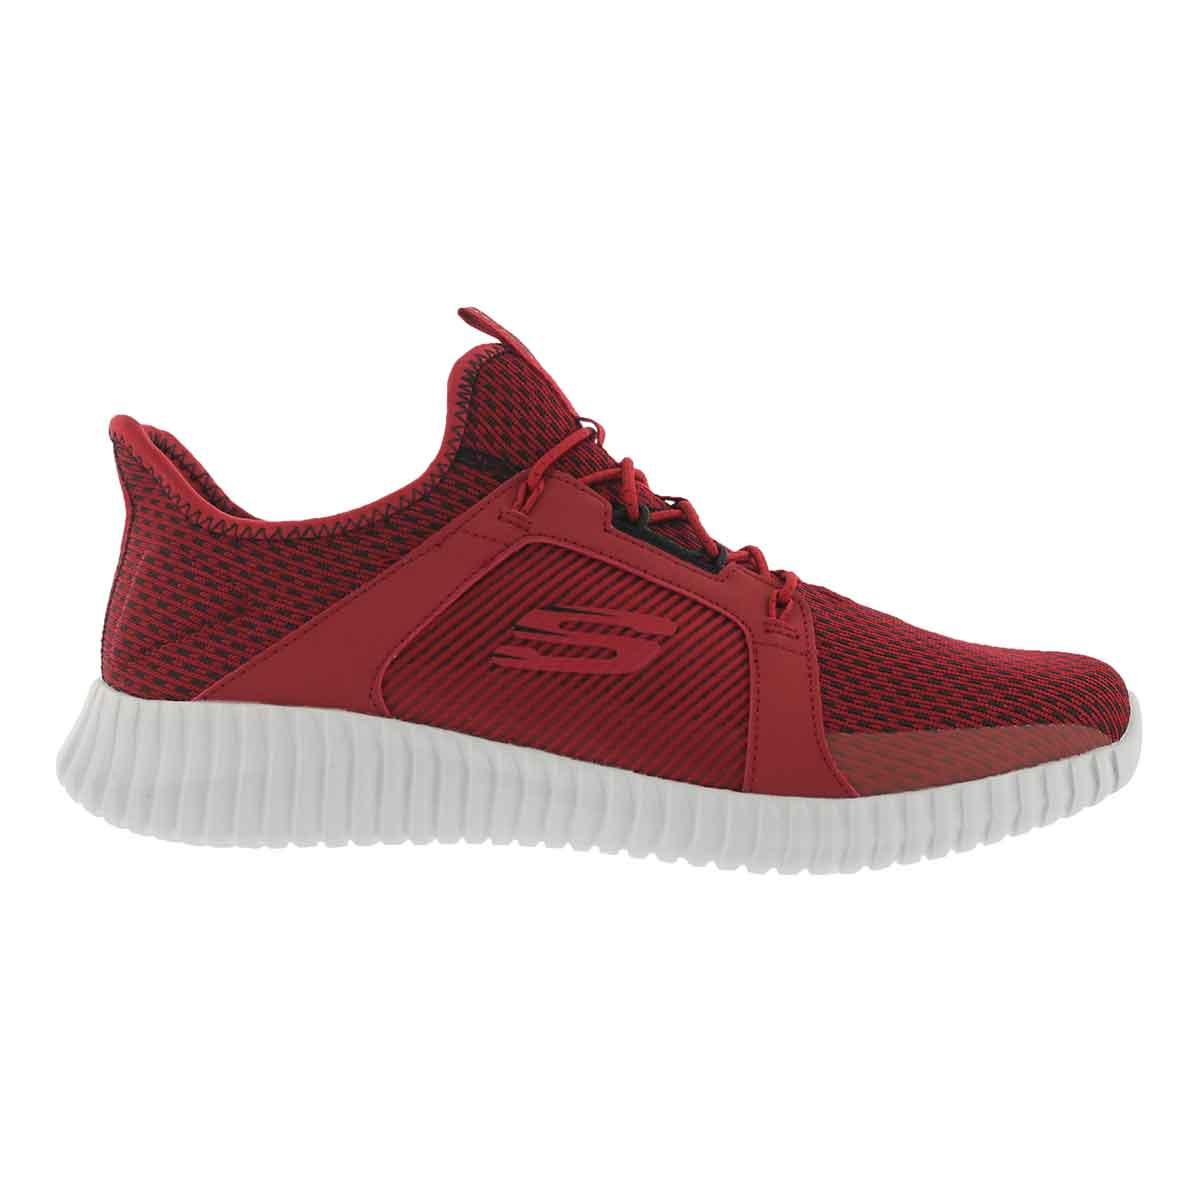 Mns Elite Flex red/blk slip on sneaker